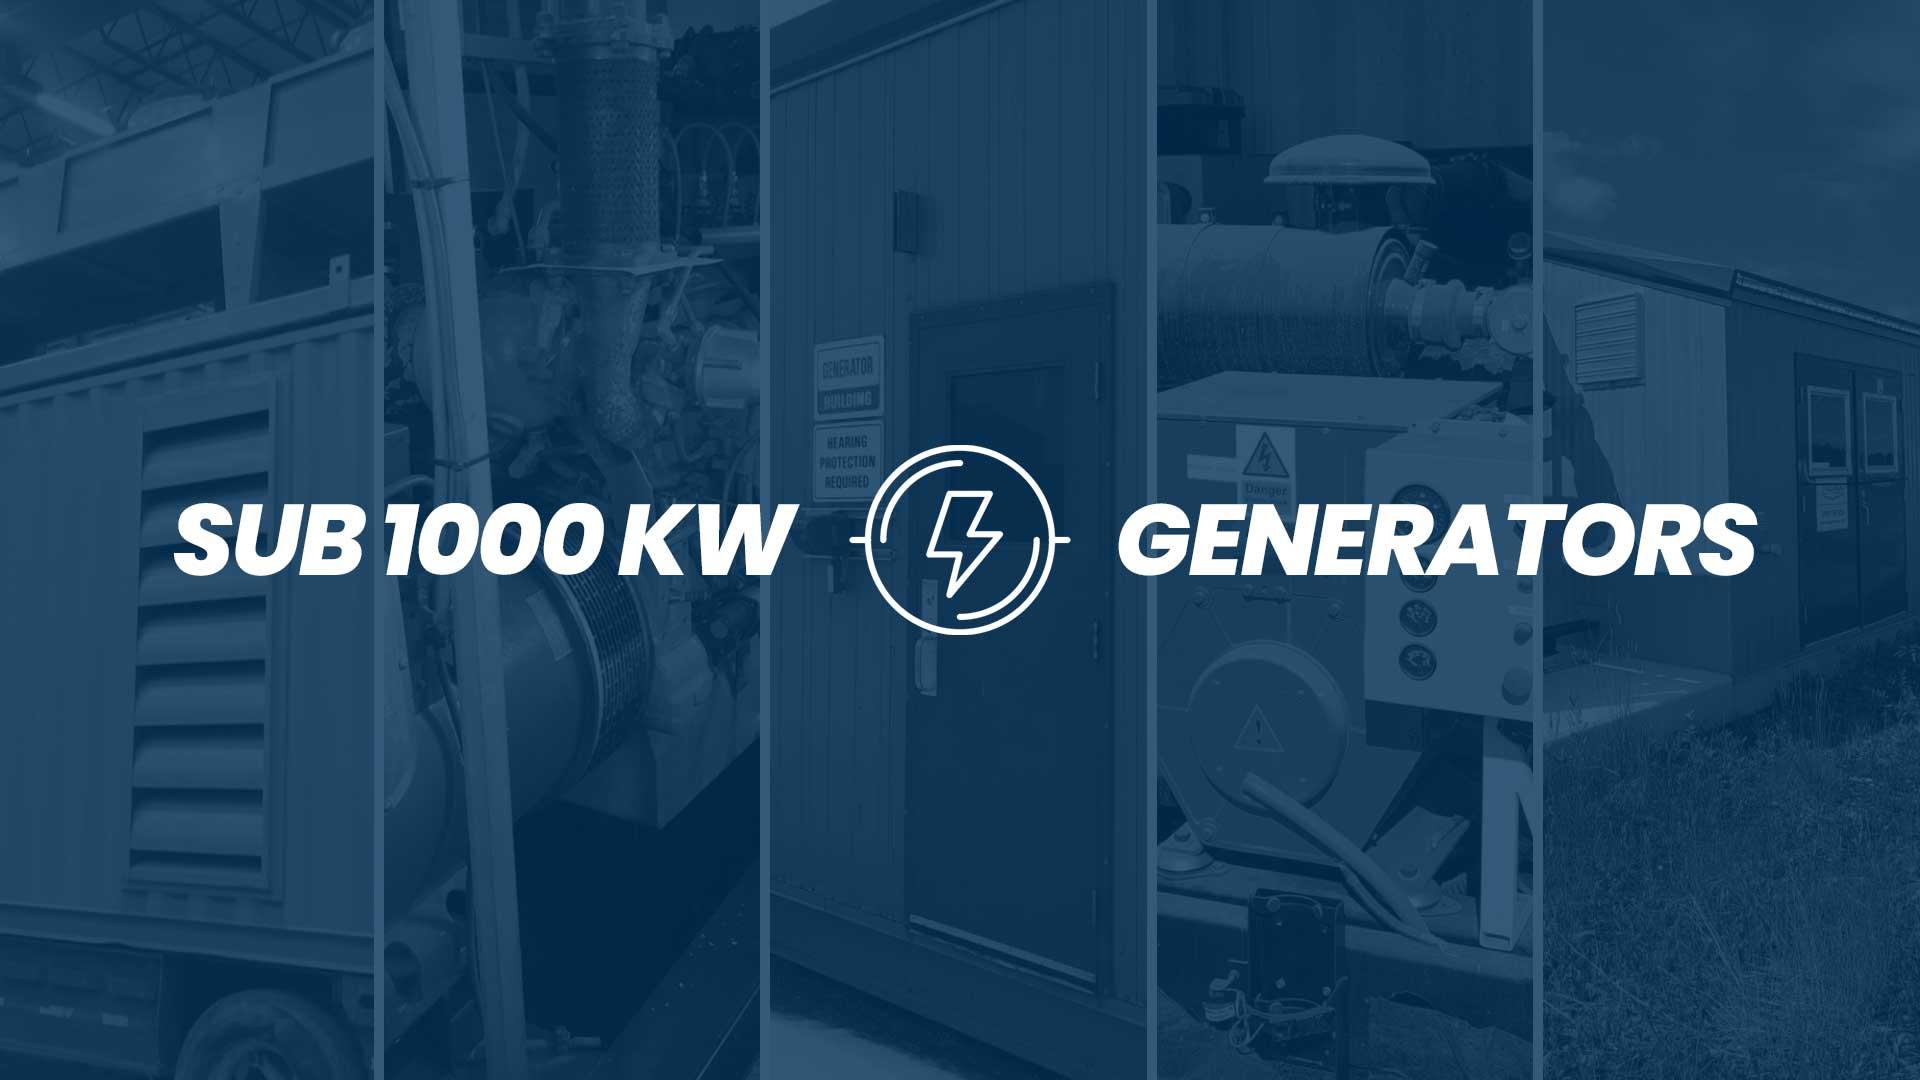 5 SUB 1000 kW (kilowatt) 1 MW Generators Just Listed! 750 kW / 550 kW / 400 kW / 200 kW / 85 kW Surplus Natural Gas Generators for Sale in Canada